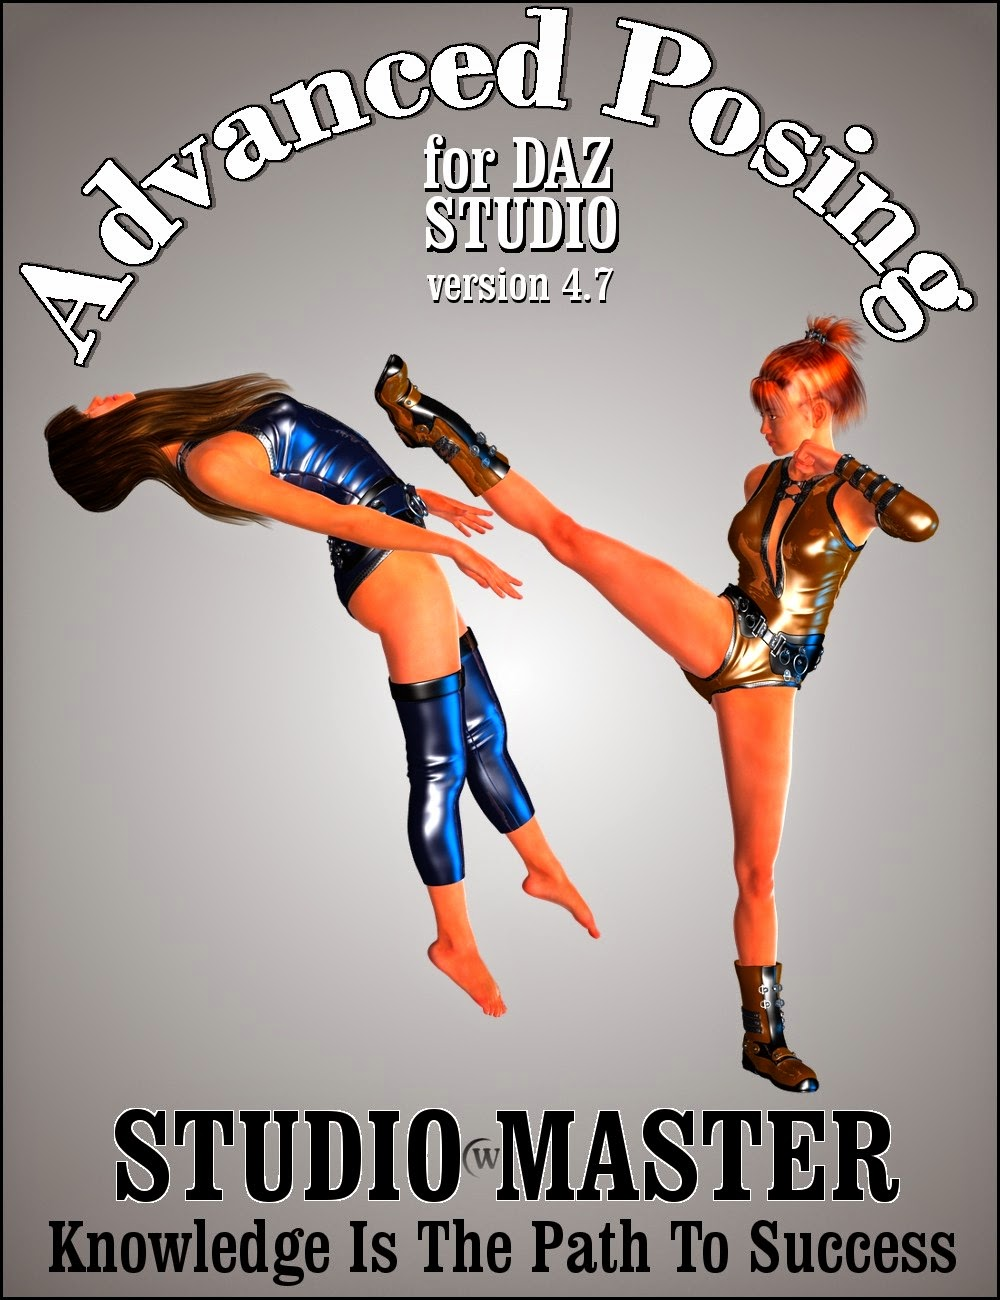 STUDIO * MASTER: avancée Posing dans DAZ Studio 4.7